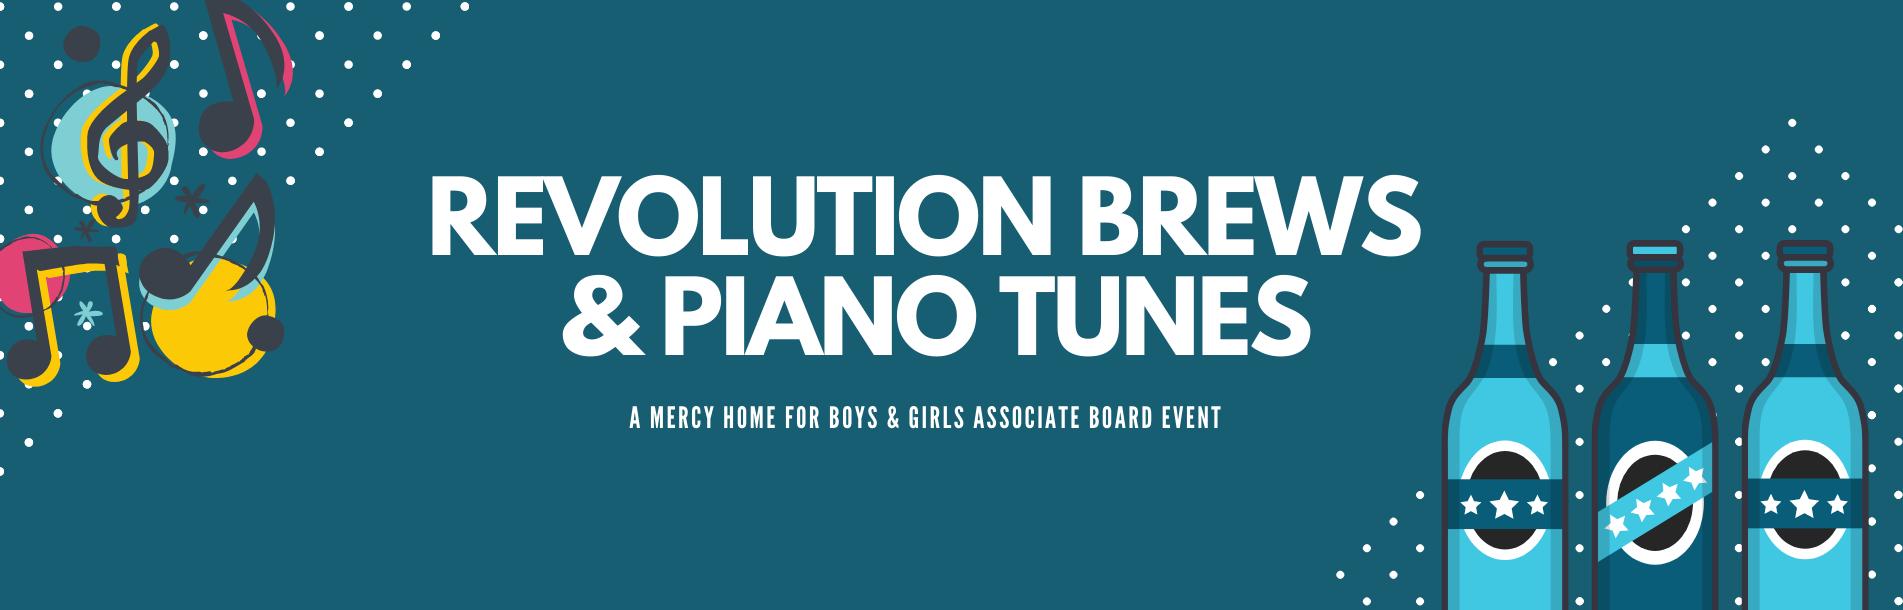 Revolution Brews & Piano Tunes